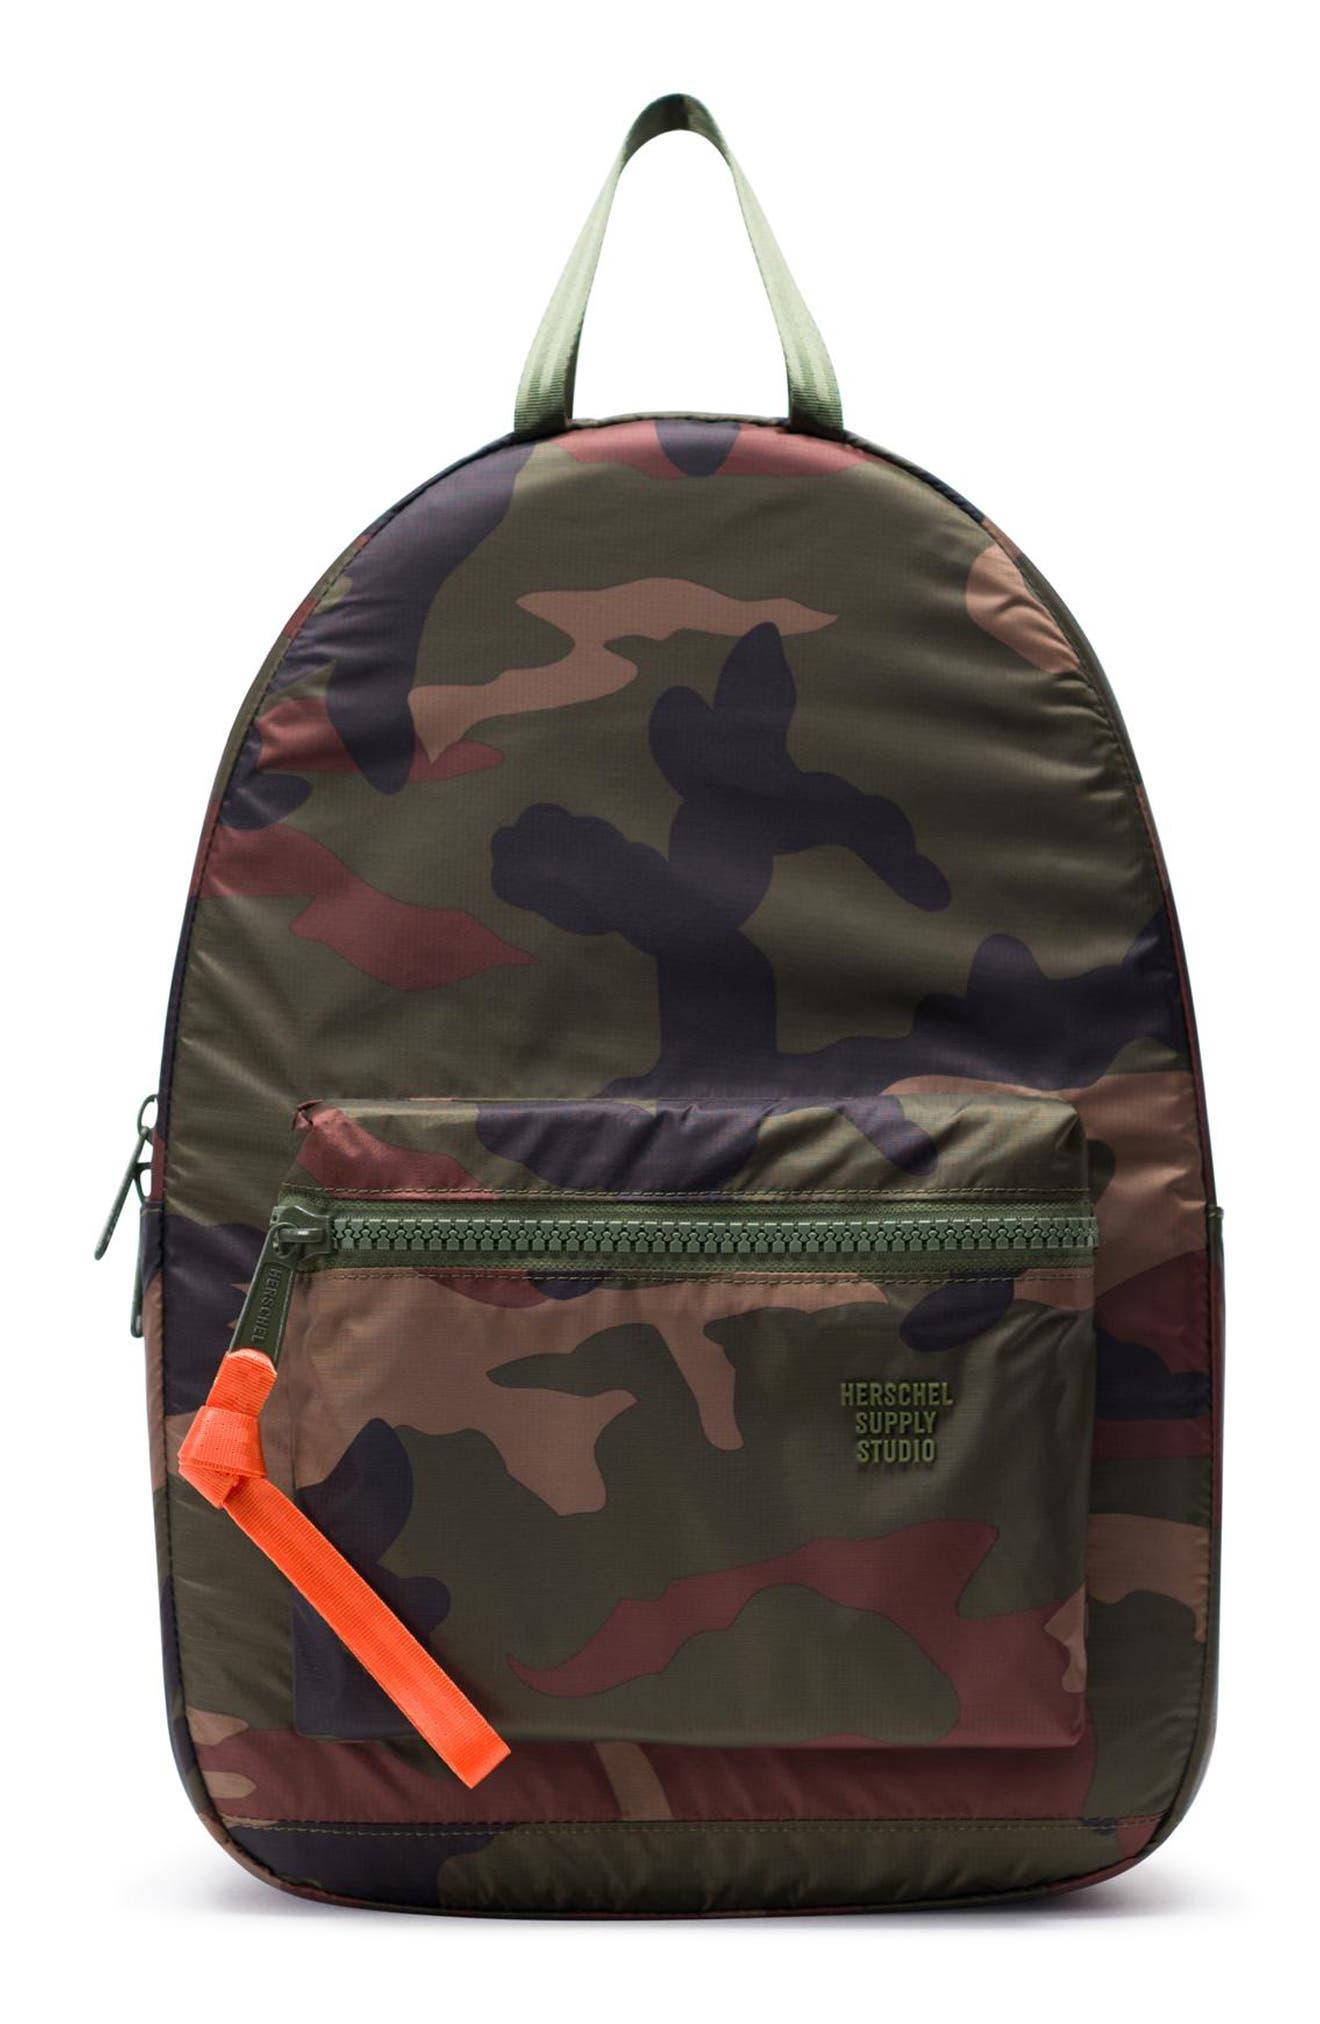 Herschel Supply Co. Hs6 Studio Collection Backpack - Green